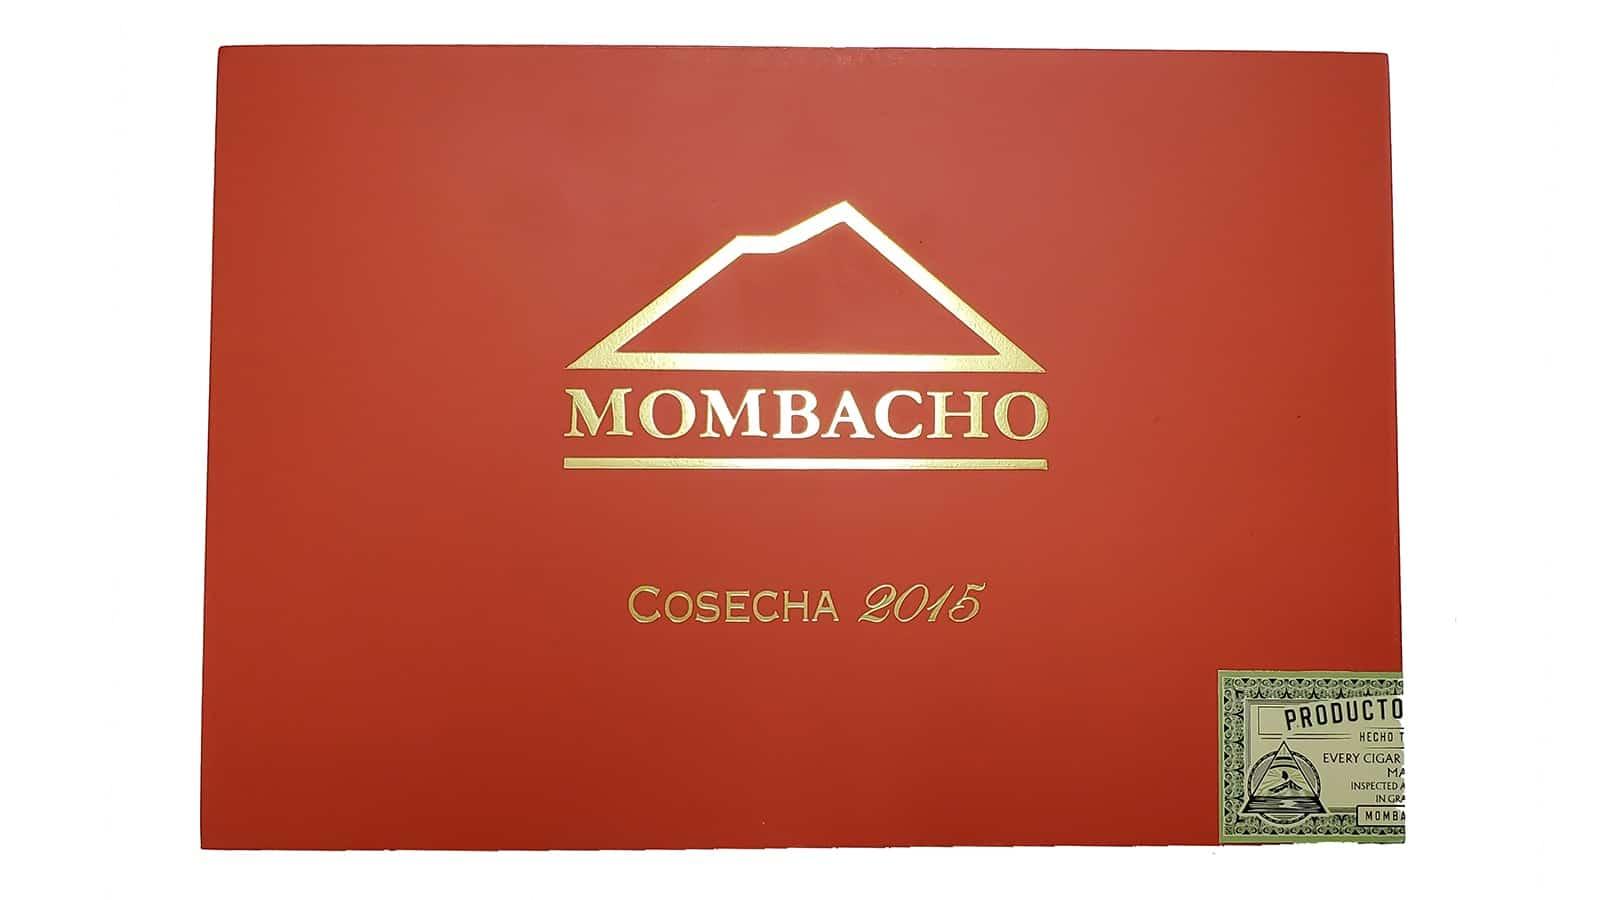 Mombacho_Cosecha_2015